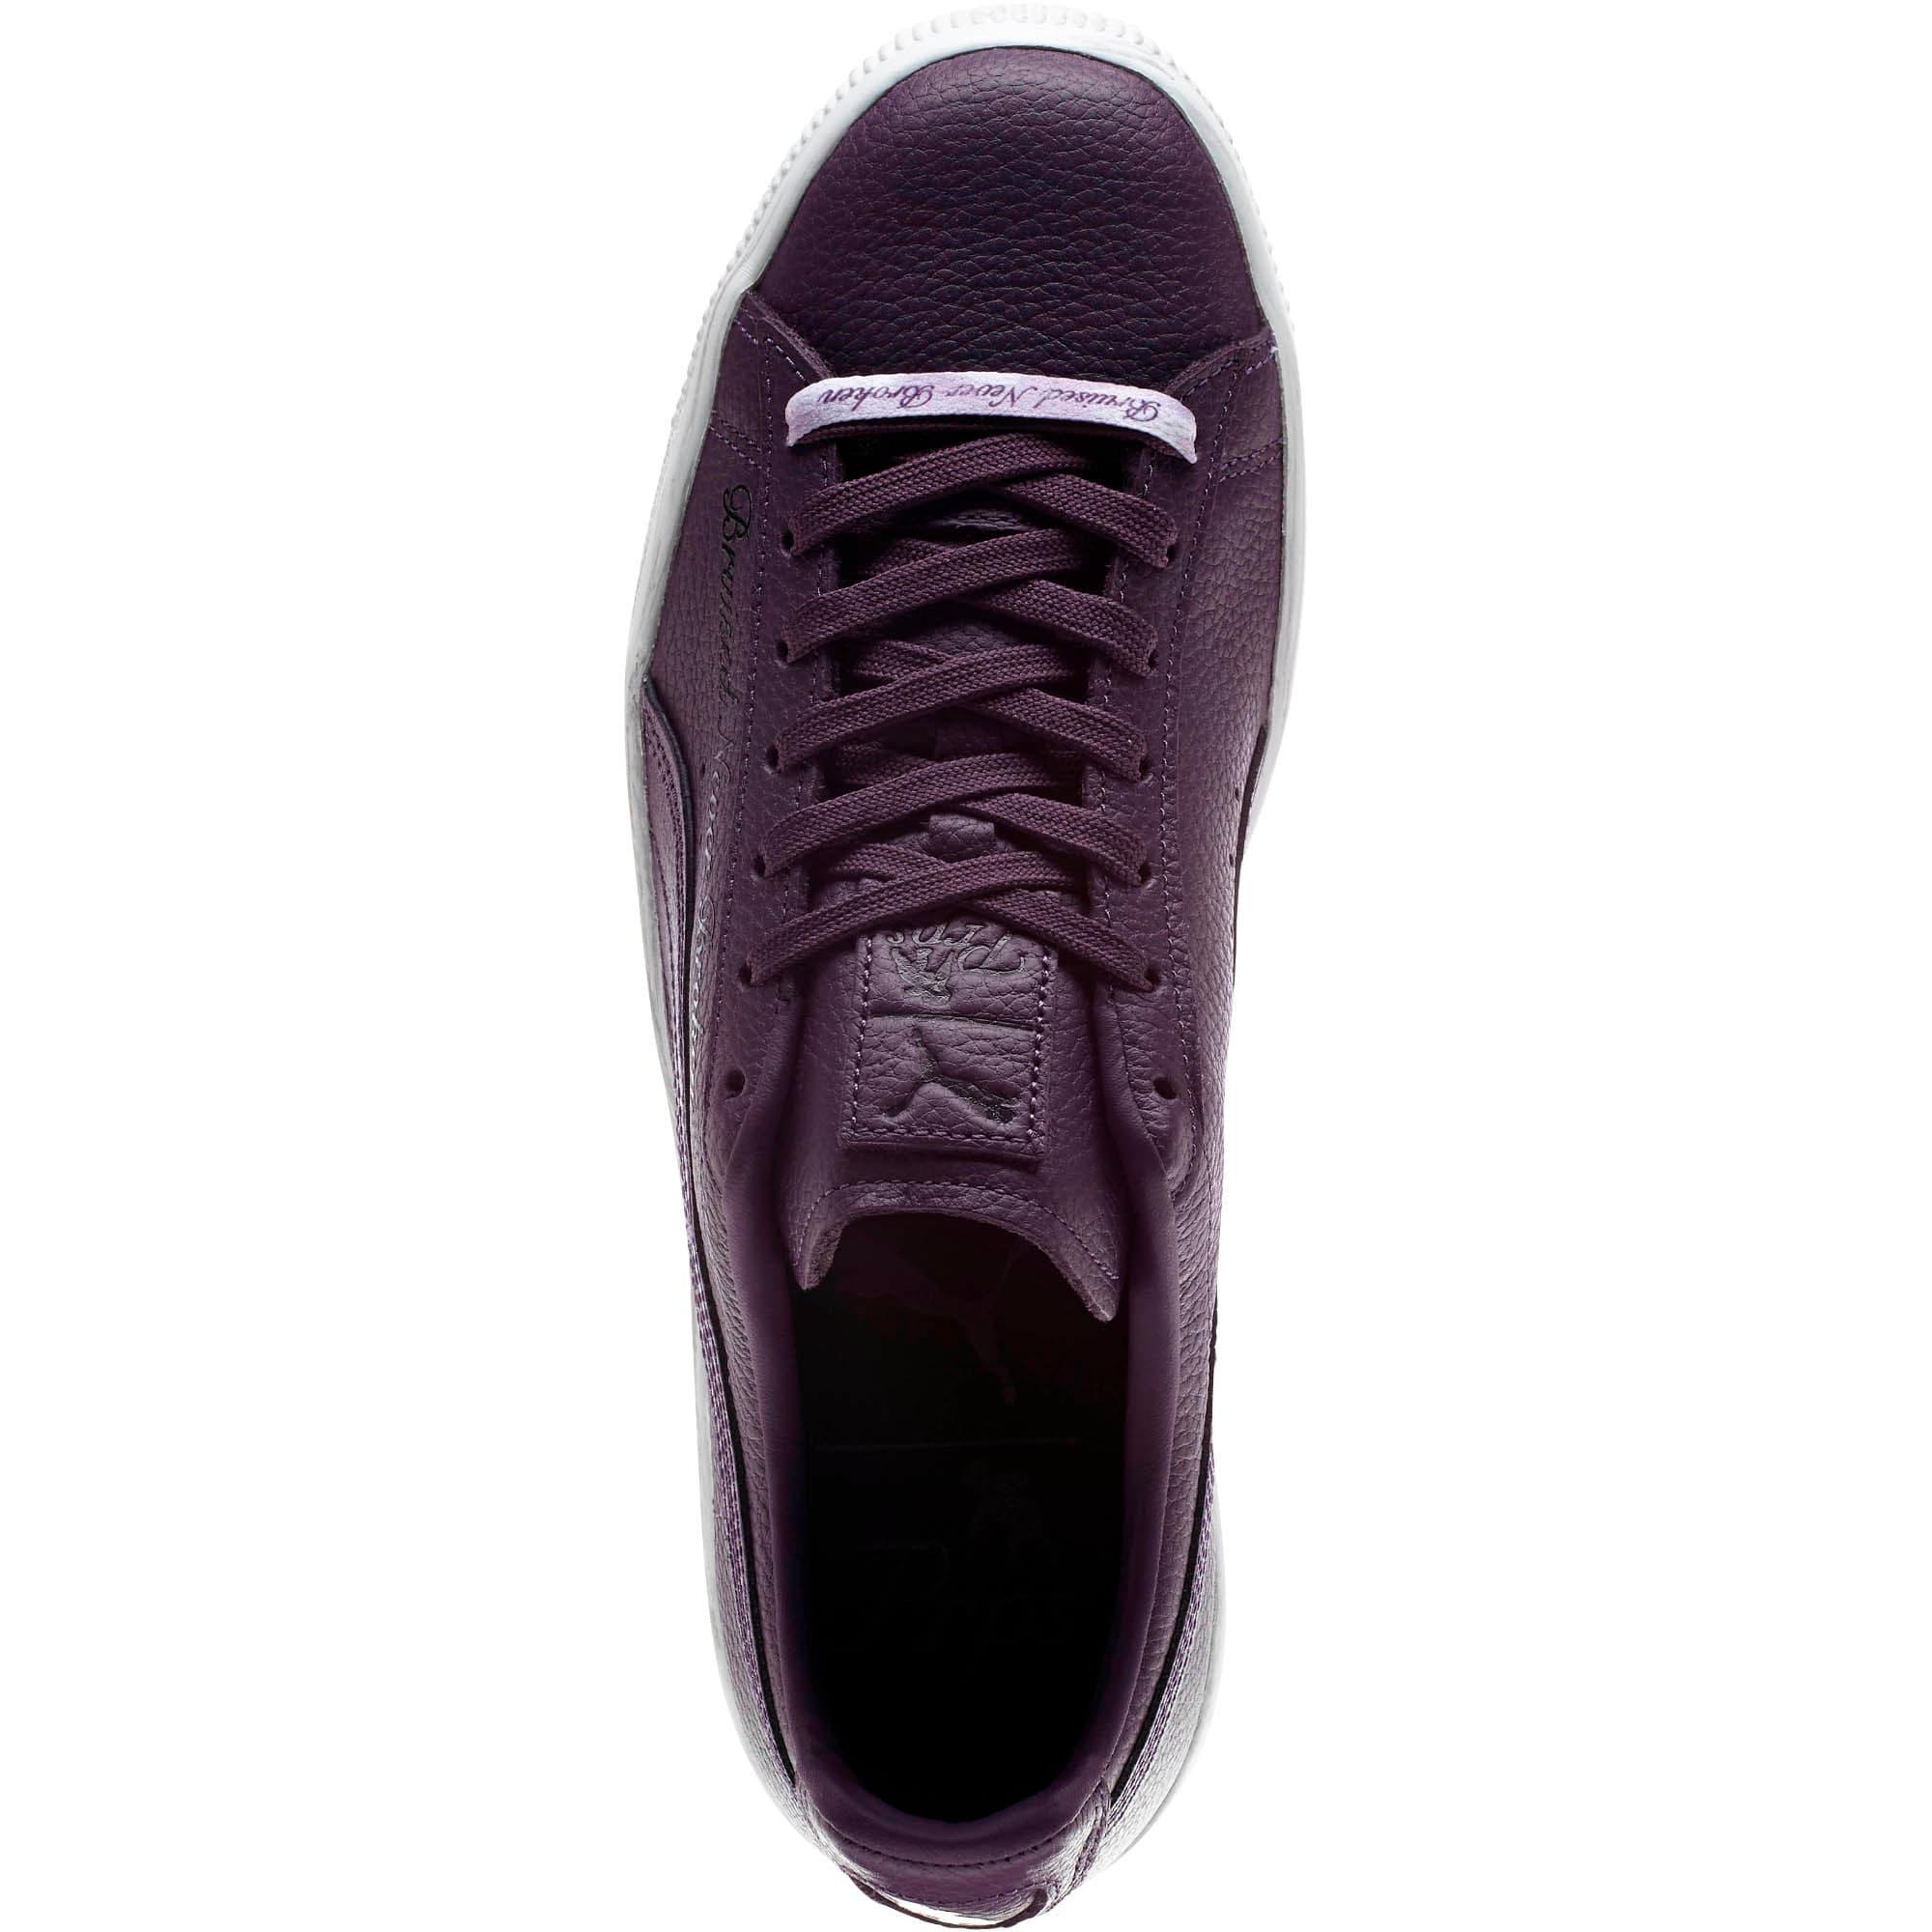 Thumbnail 5 of Clyde x PRPS Sneakers, Indigo-Puma Black, medium